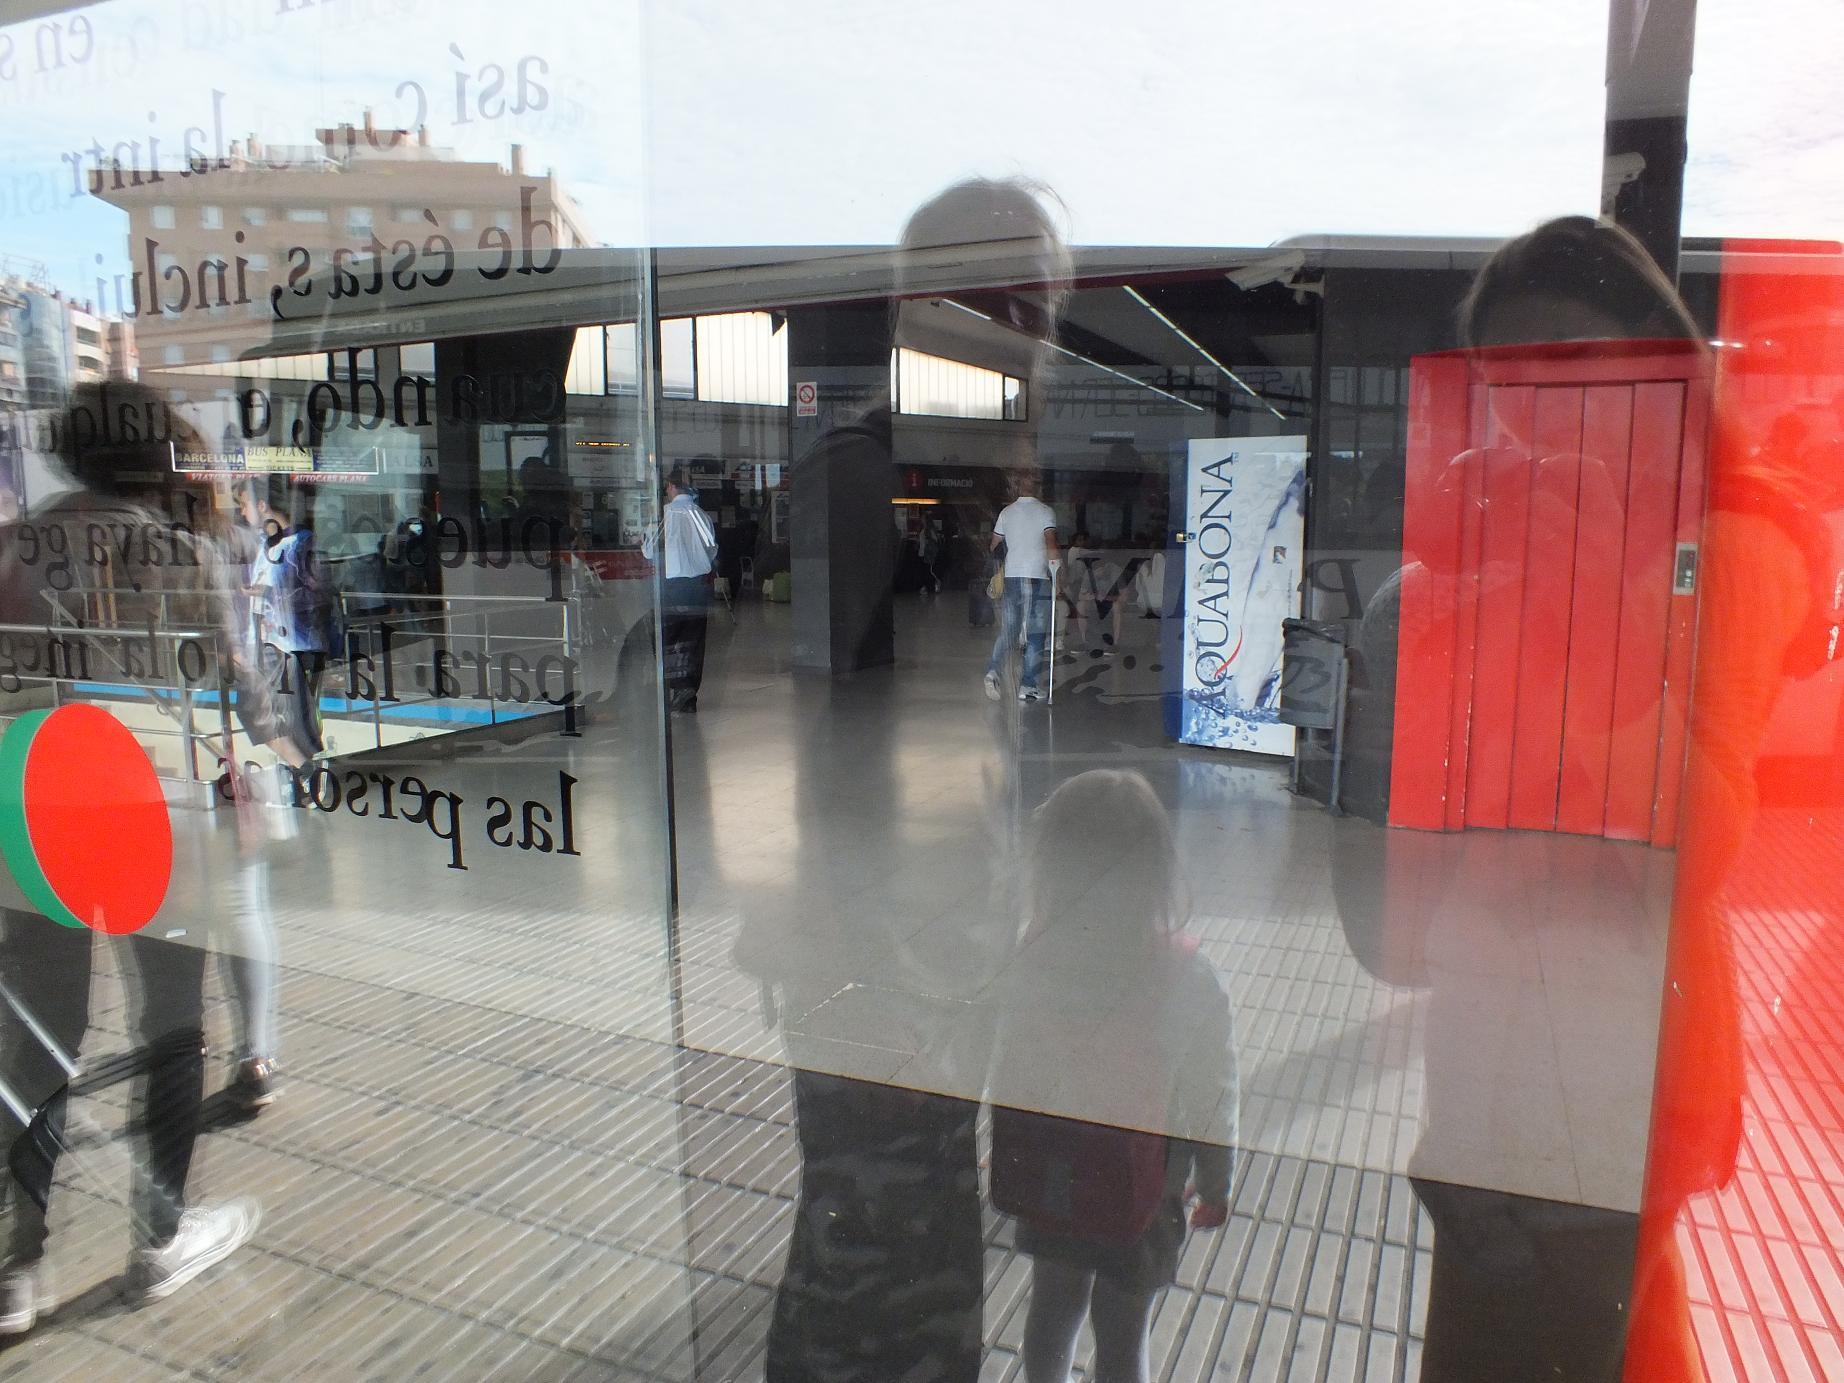 Tarragona bus station